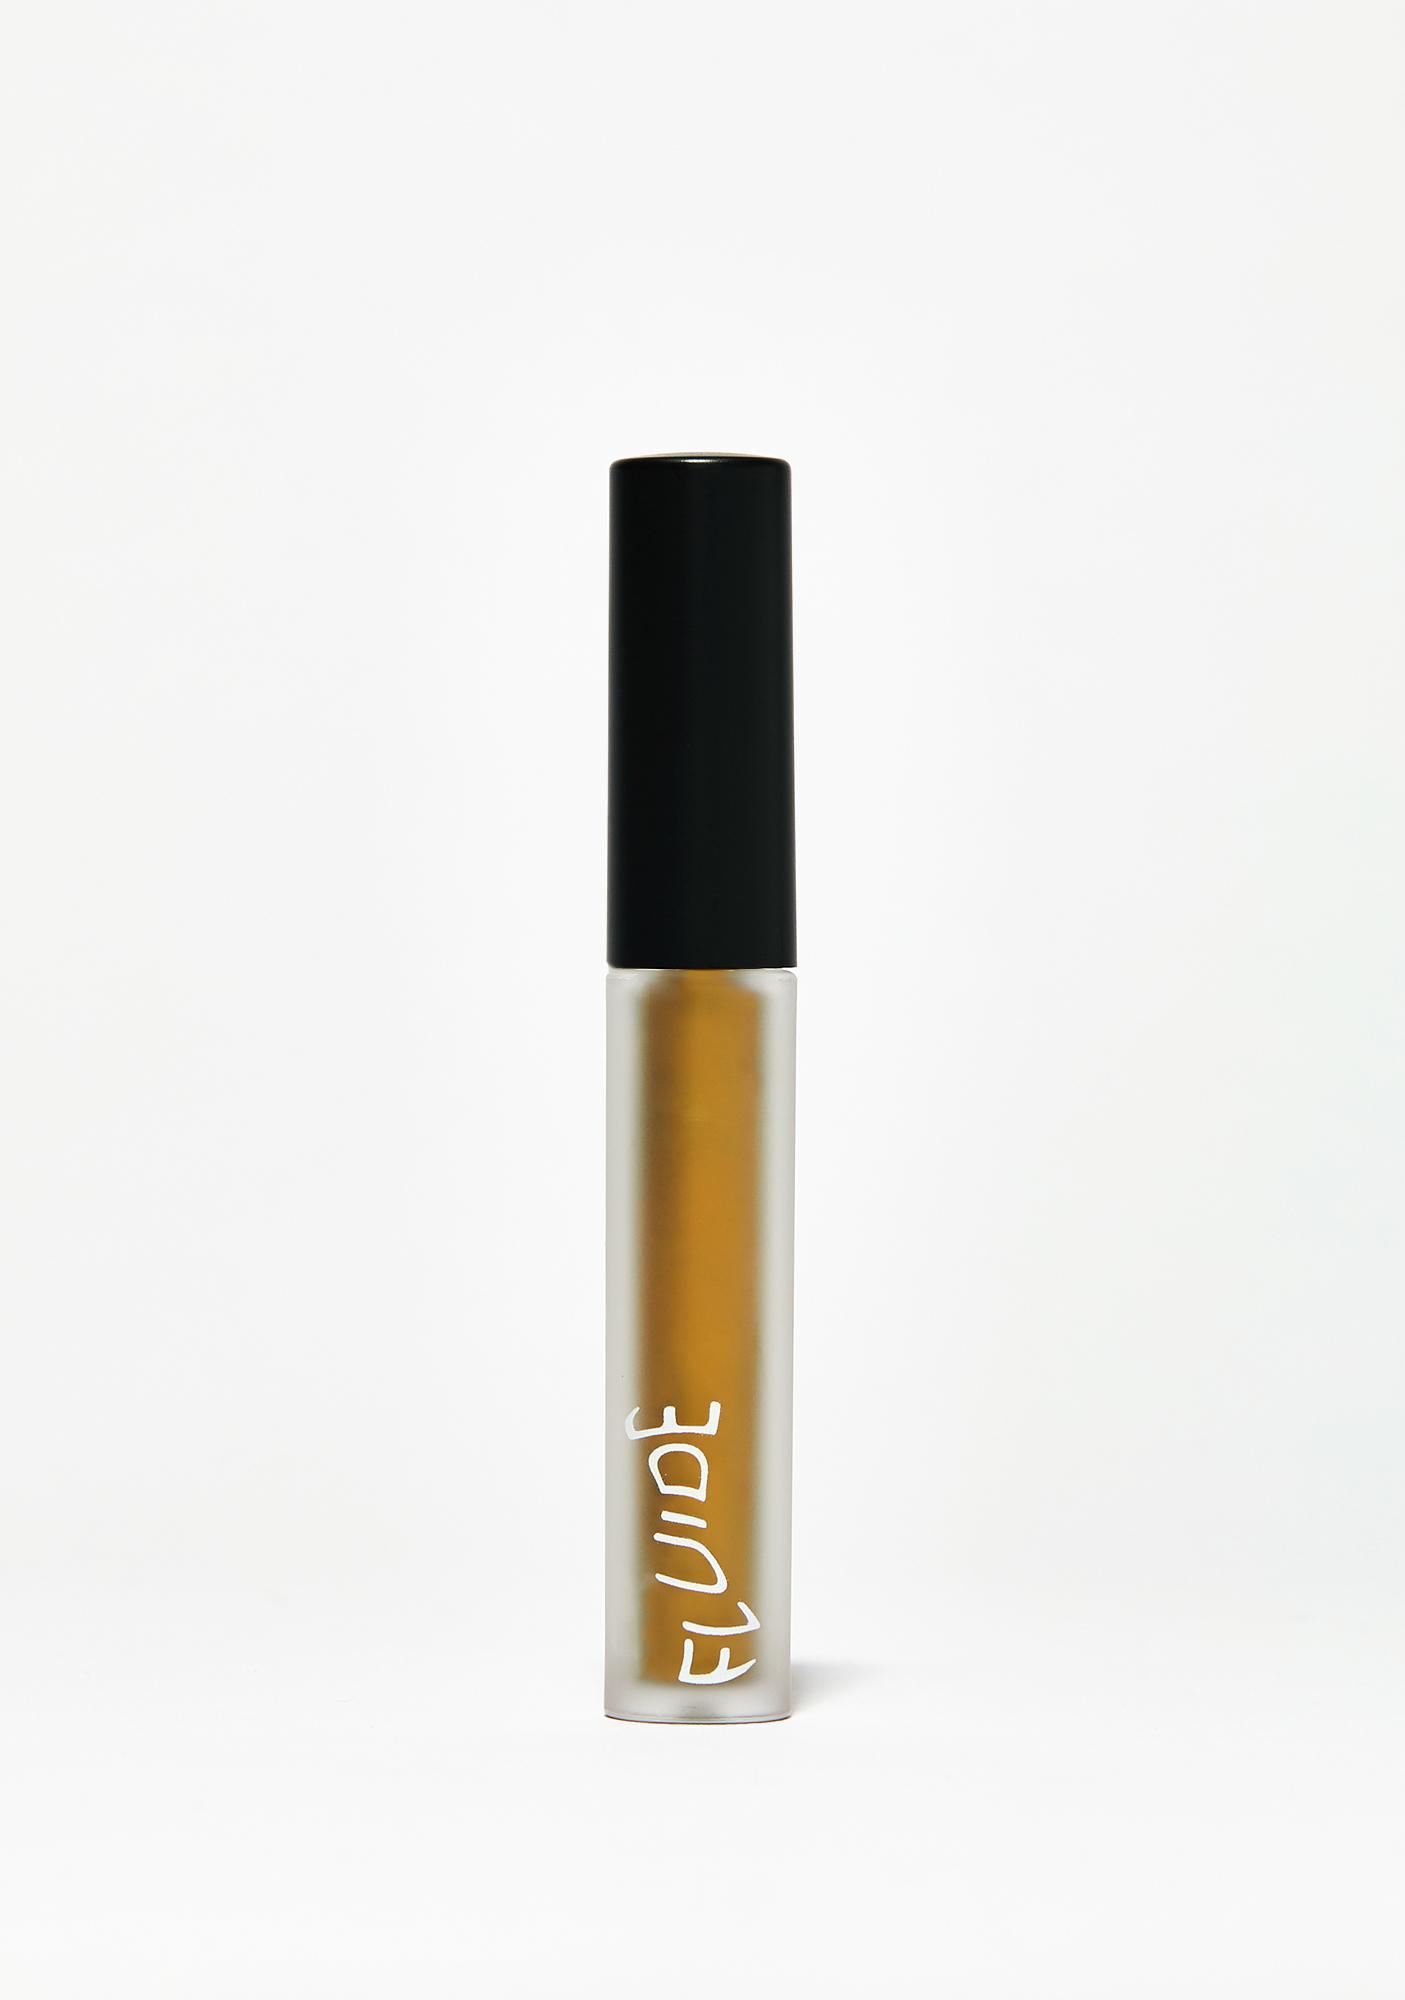 Fluide Pat Liquid Lipstick